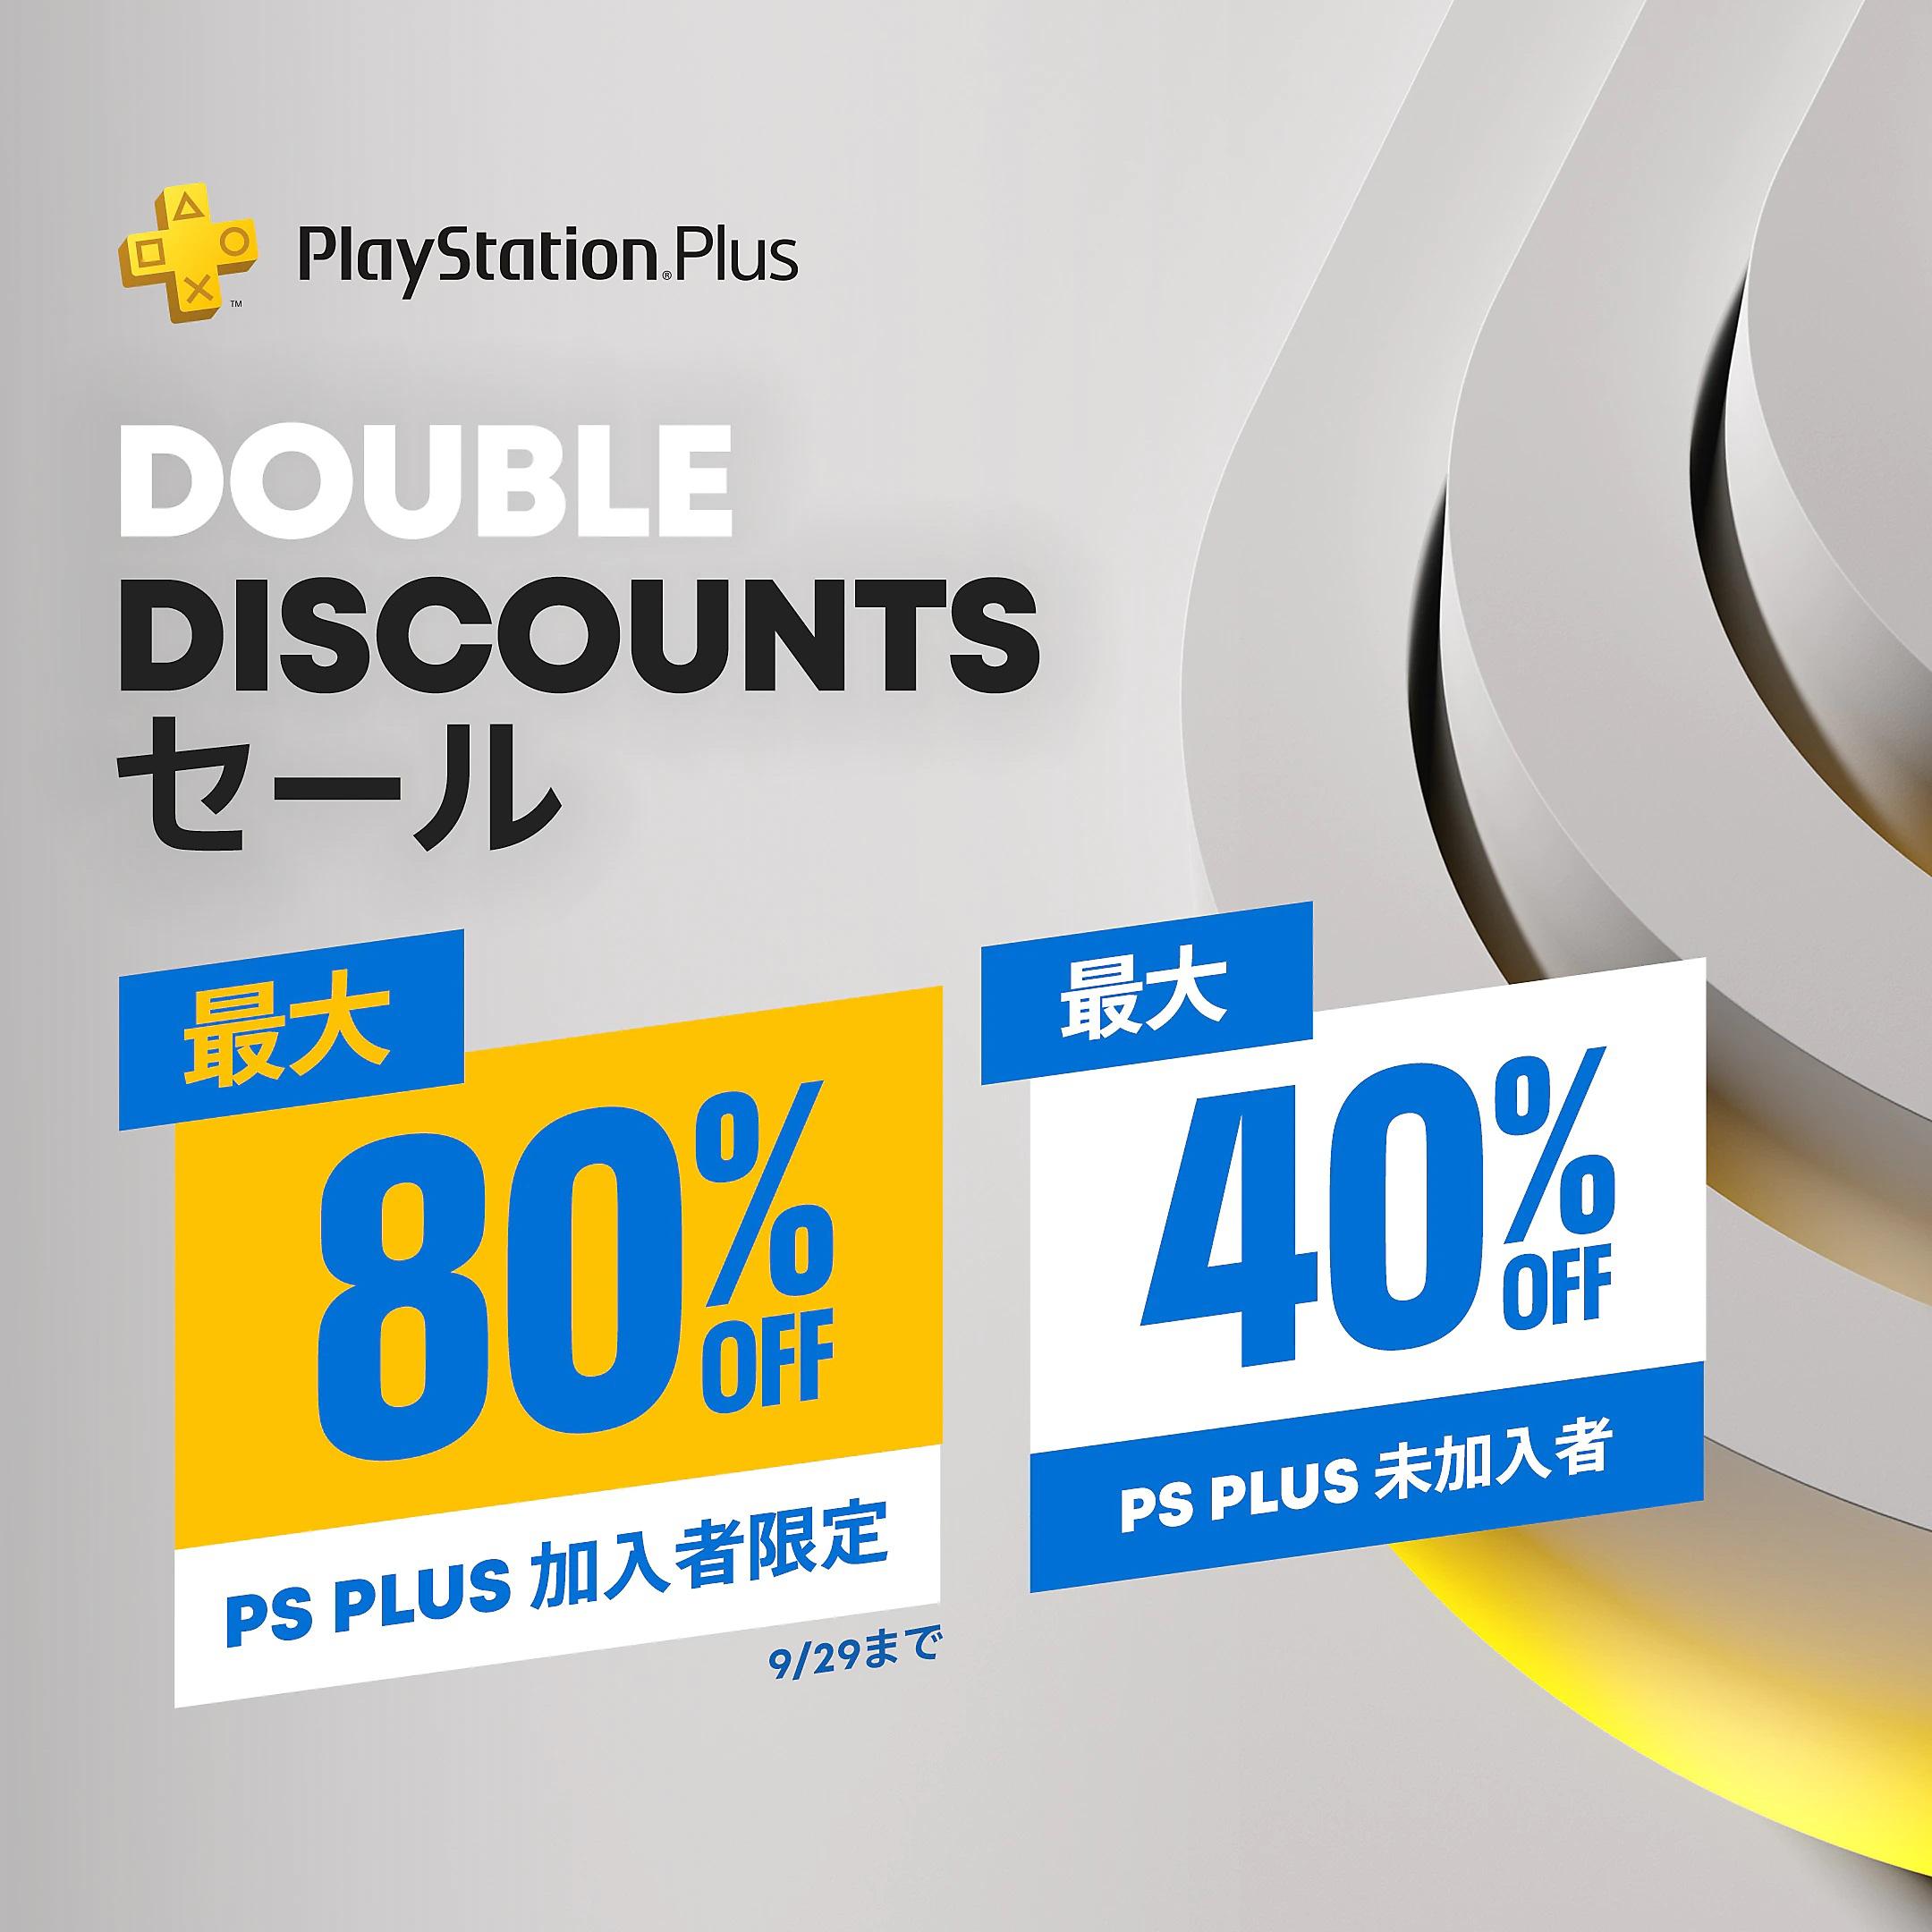 PlayStation Plus Double Discounts